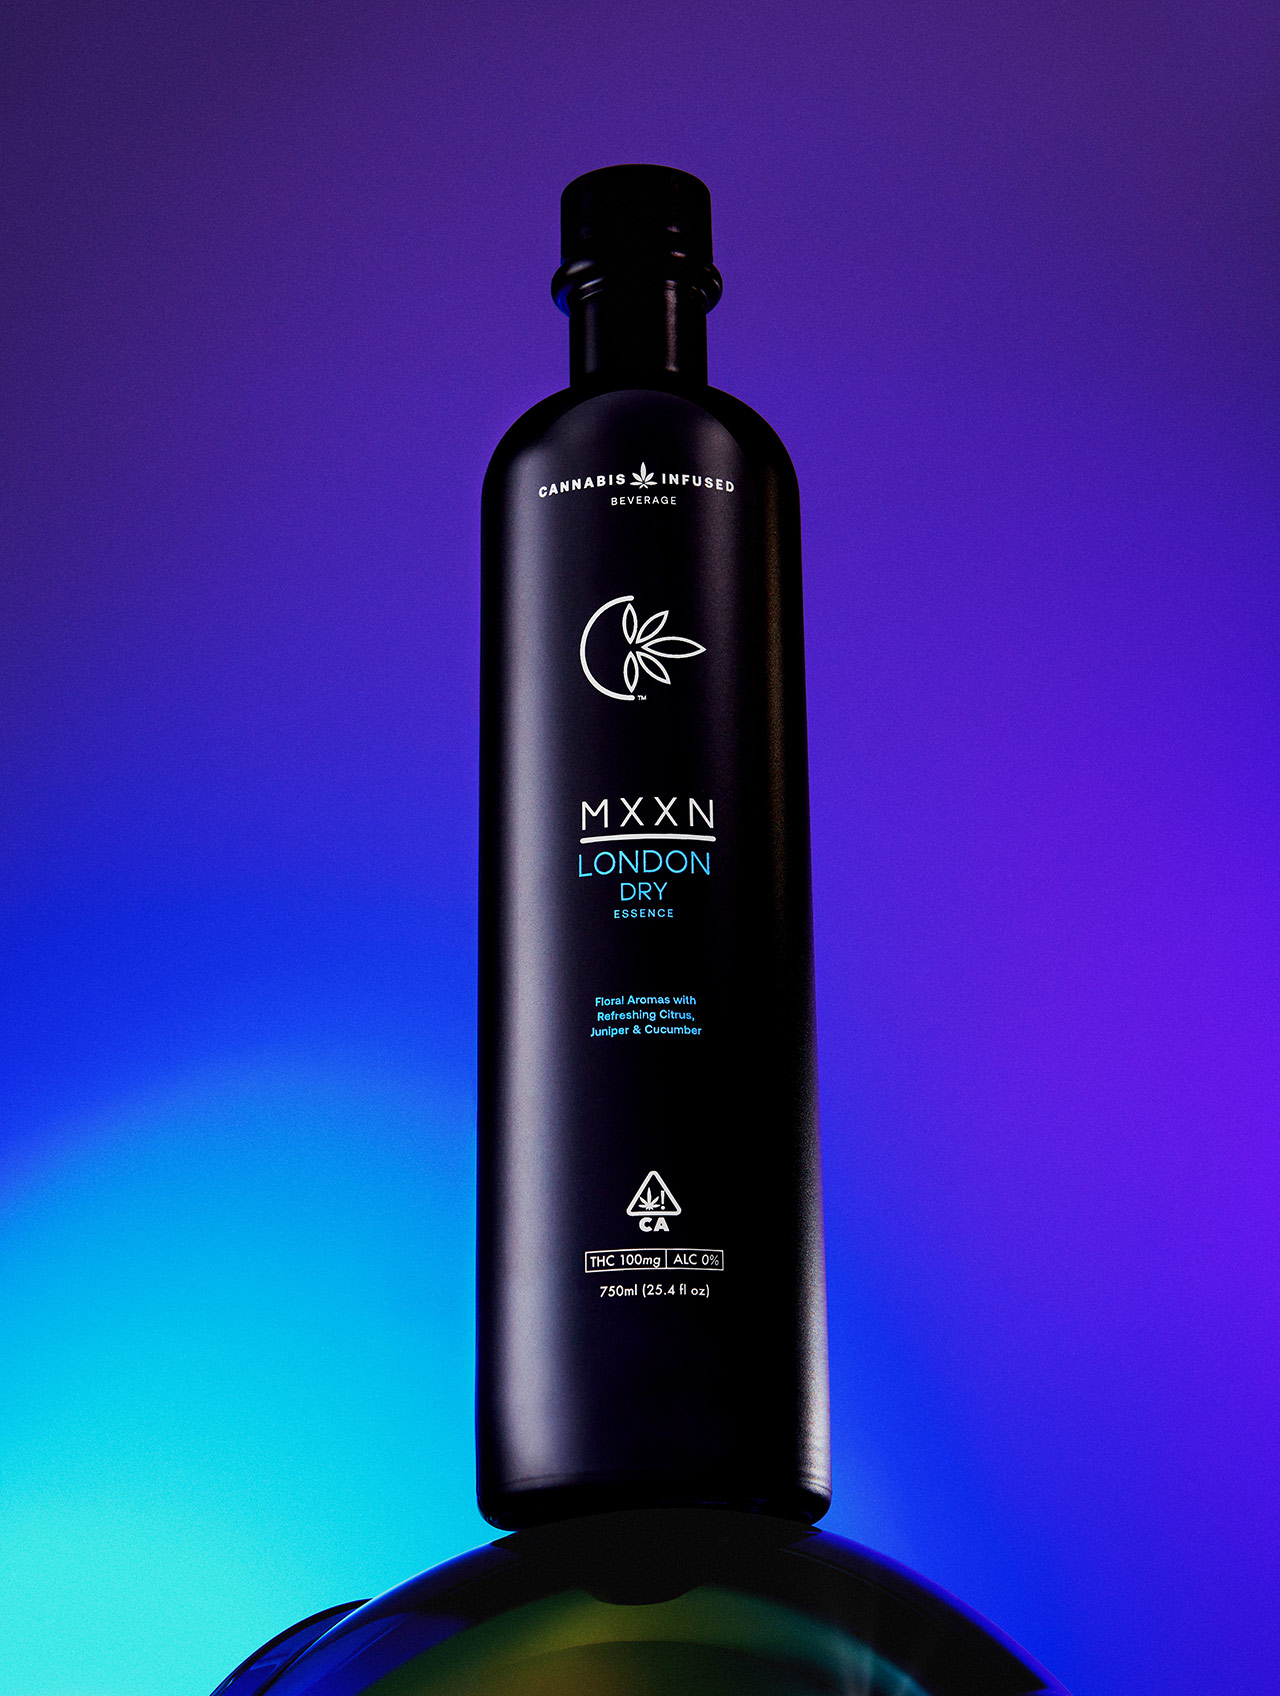 MXXN London Dry: THC-Infused, Alcohol-Free Spirit